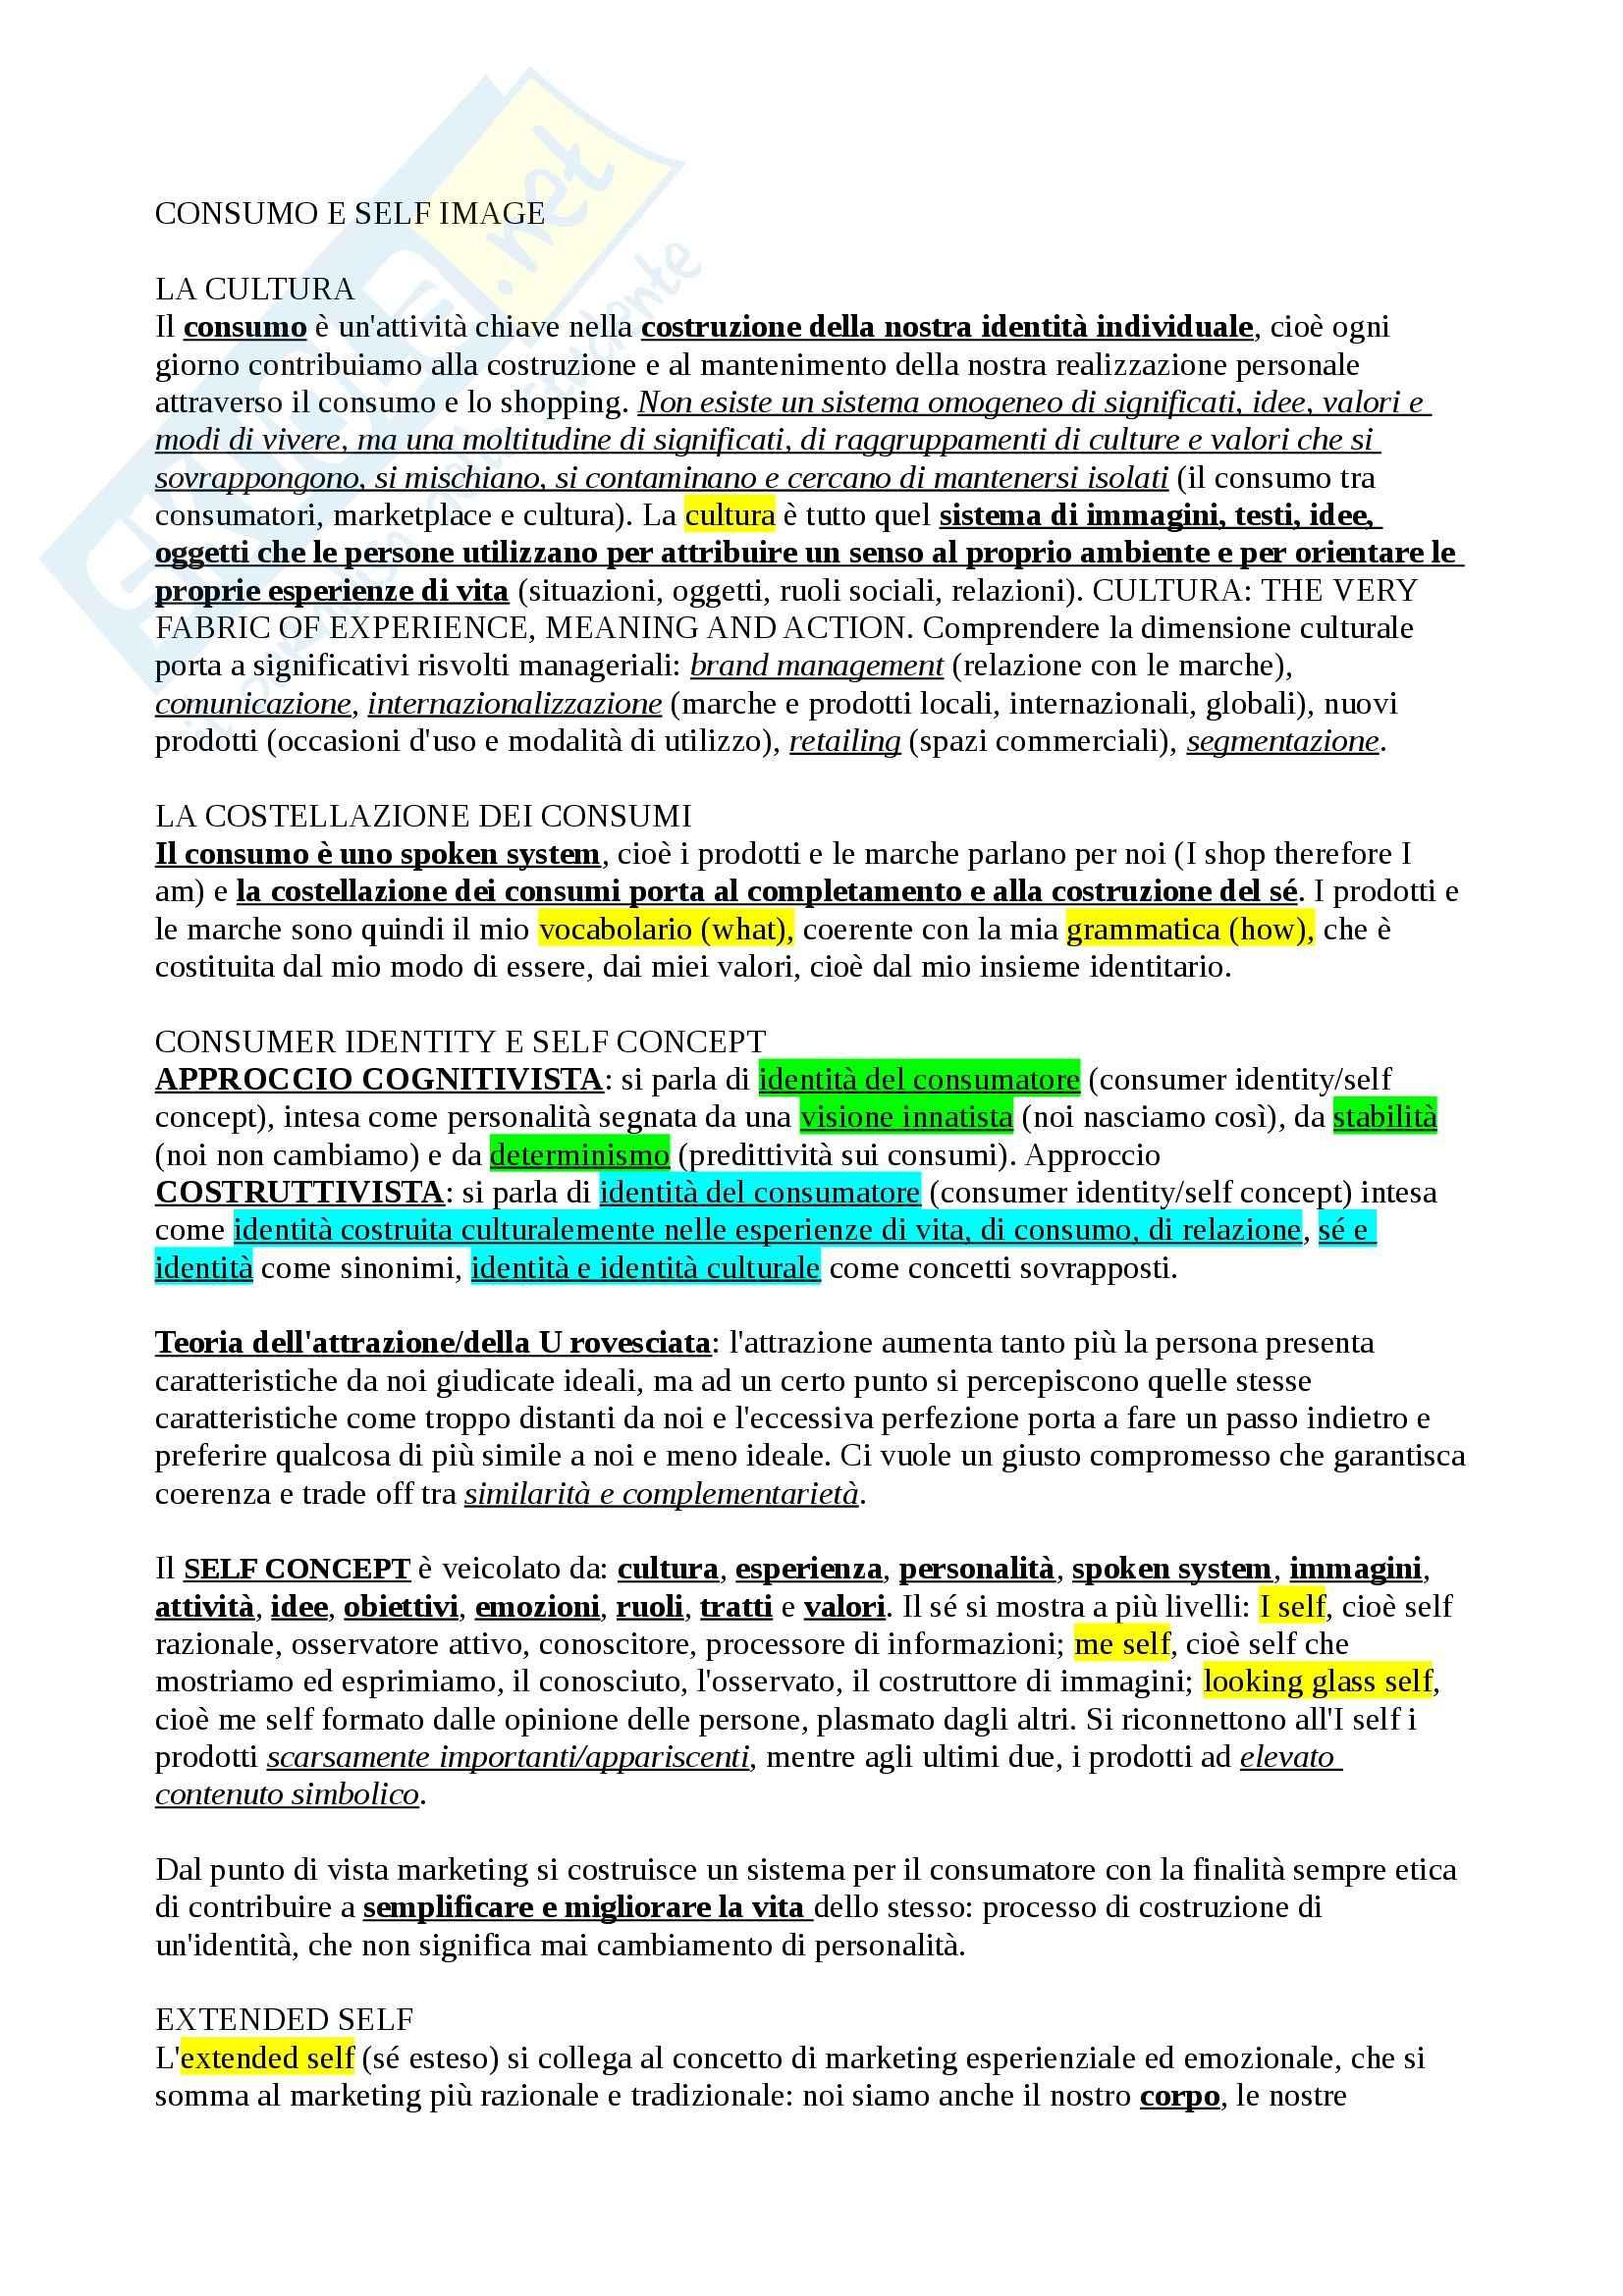 appunto S. Borghini Understanding Consumer 2